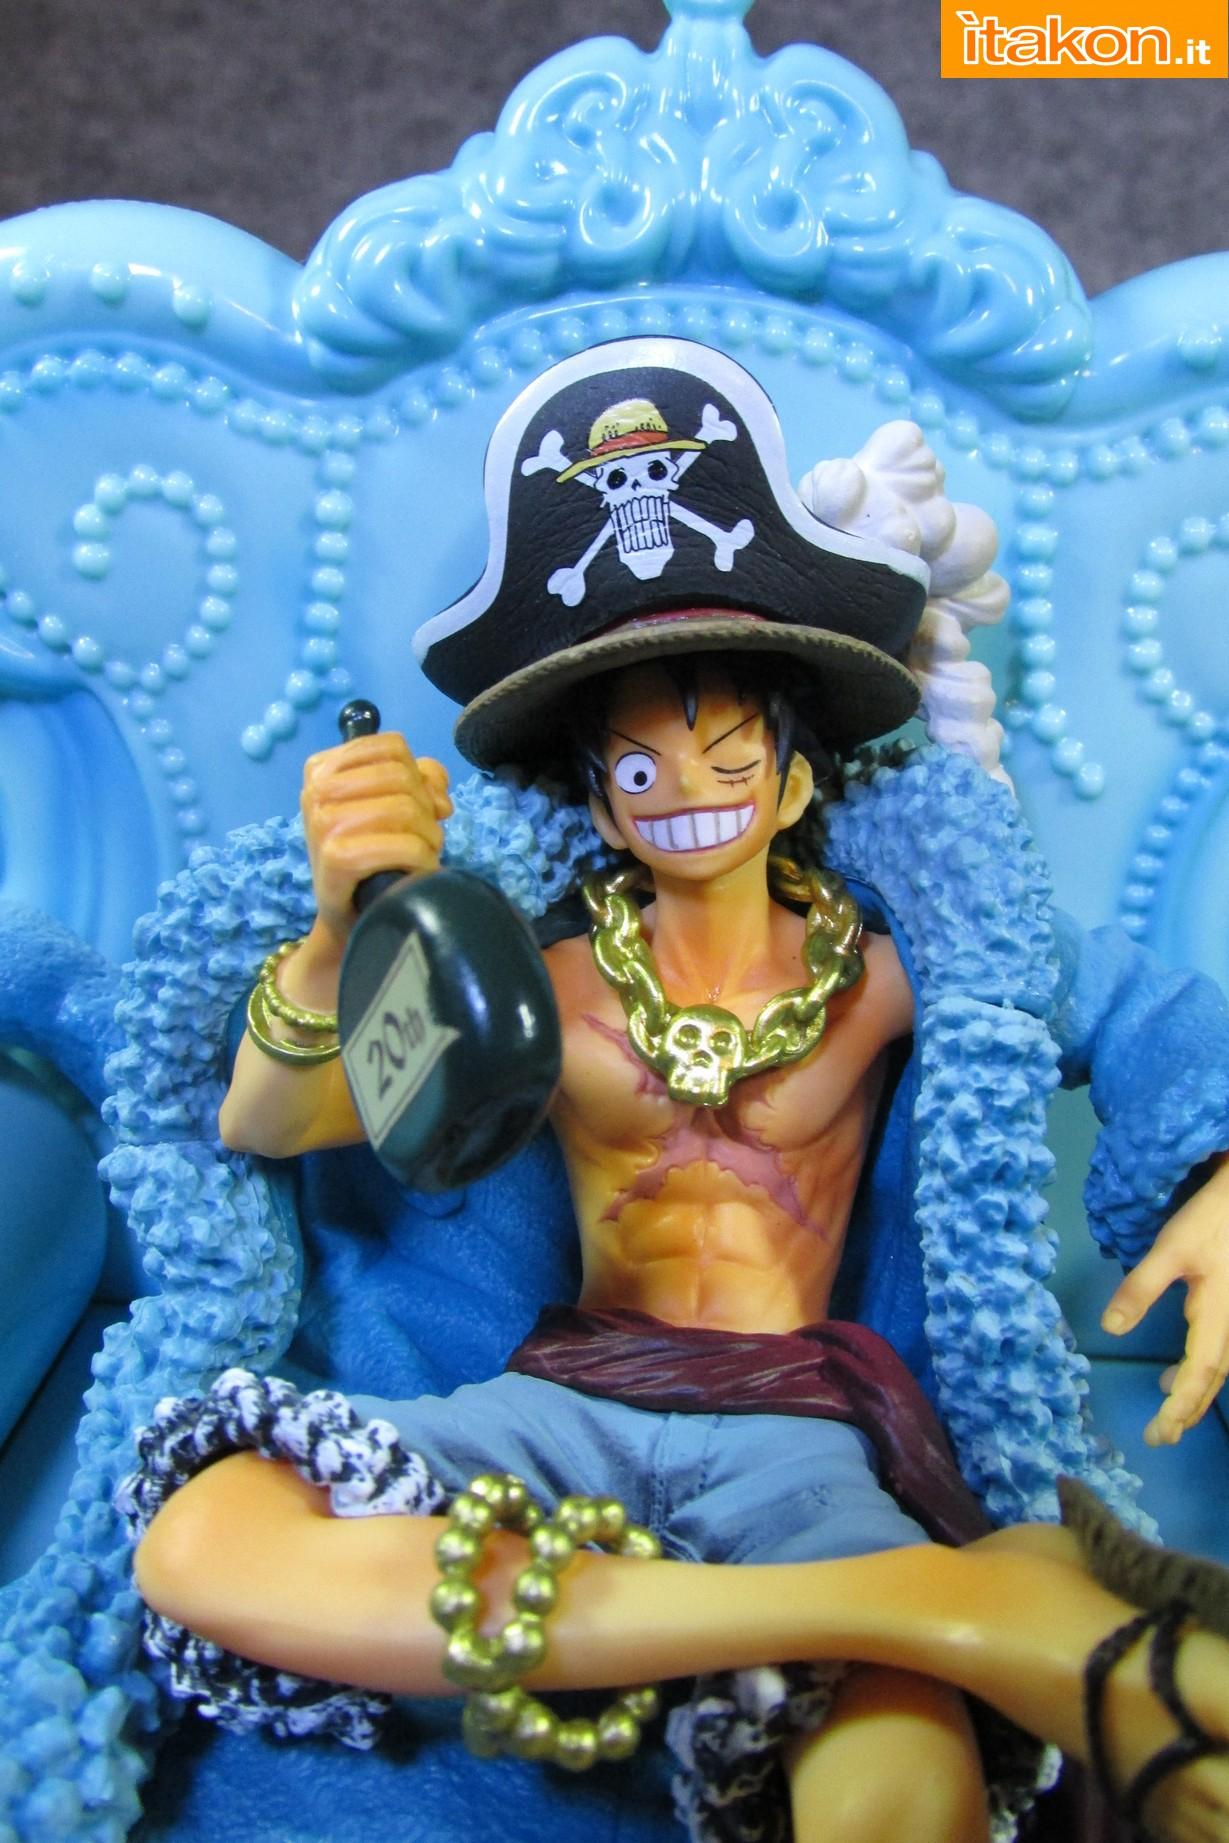 Link a Recensione Review Monkey D. Luffy One Piece 20th Anniversary ver. Figuarts ZERO di Bandai 46